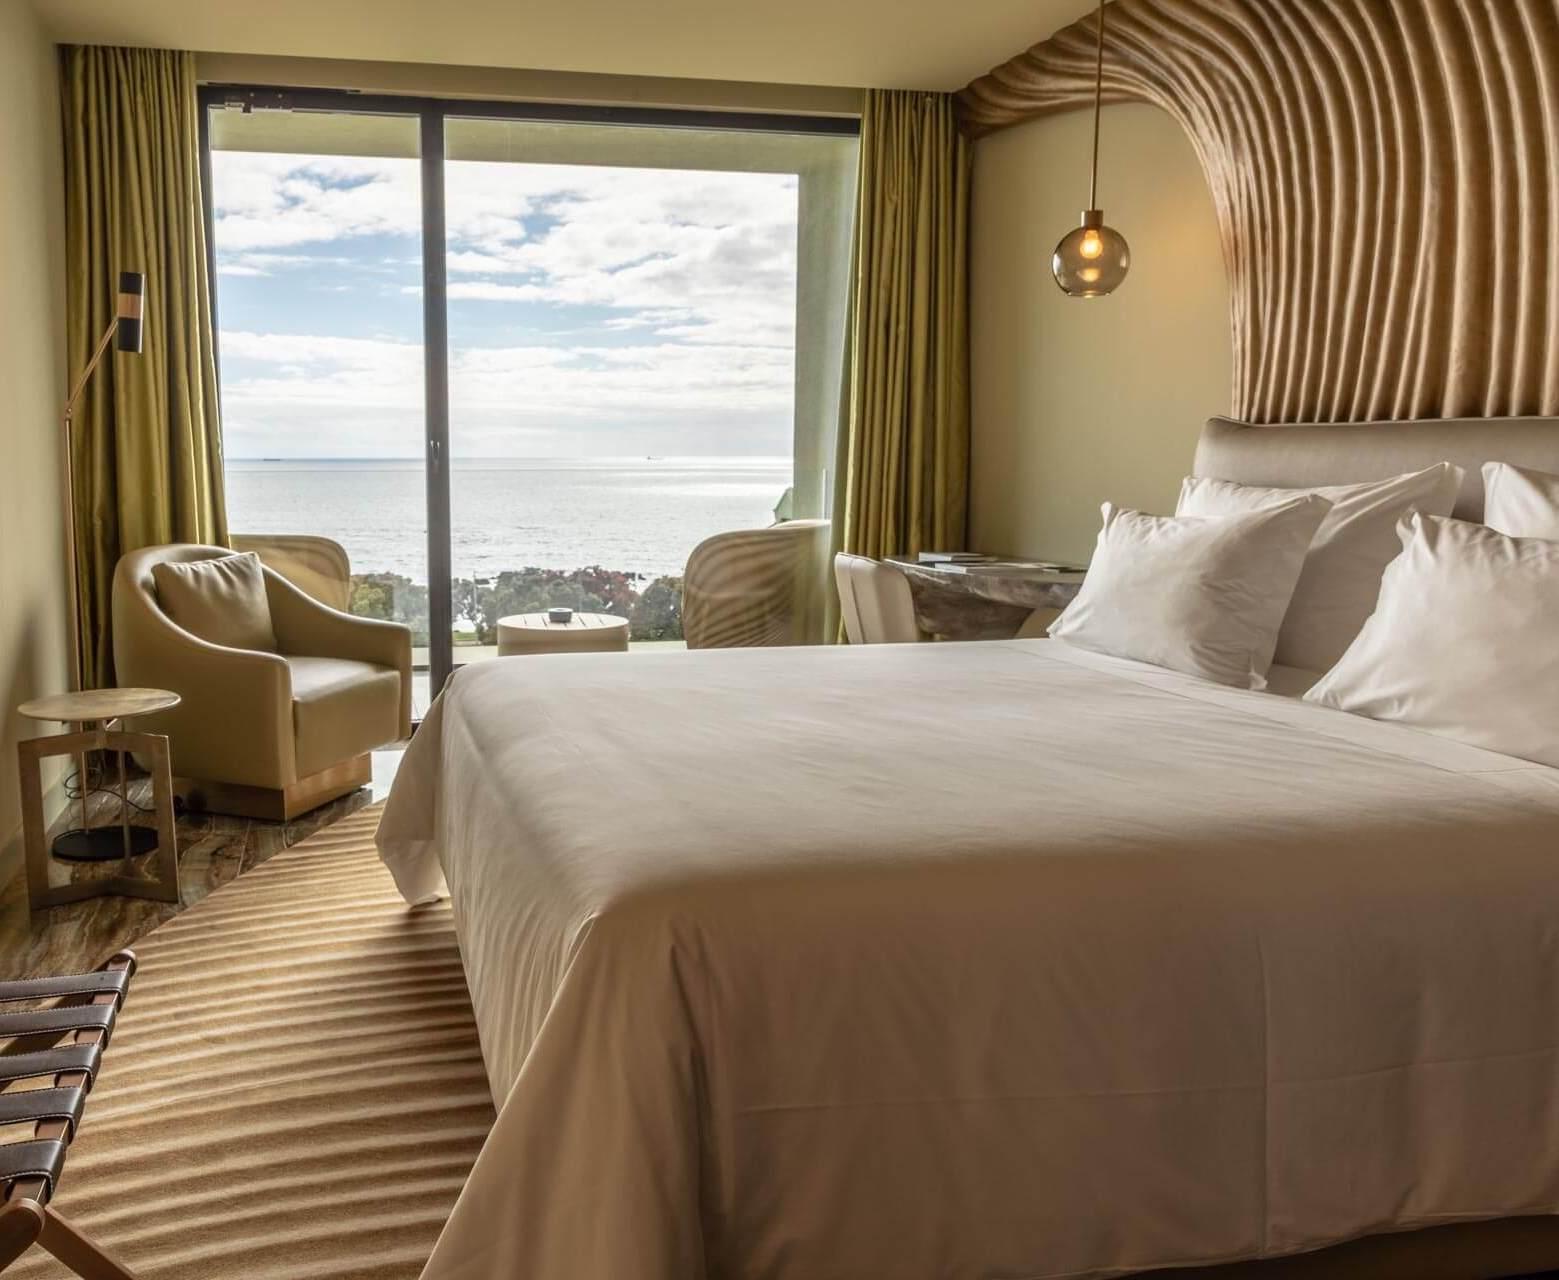 Chambre vue sur mer à la Vila Foz © Vila Foz Hotel